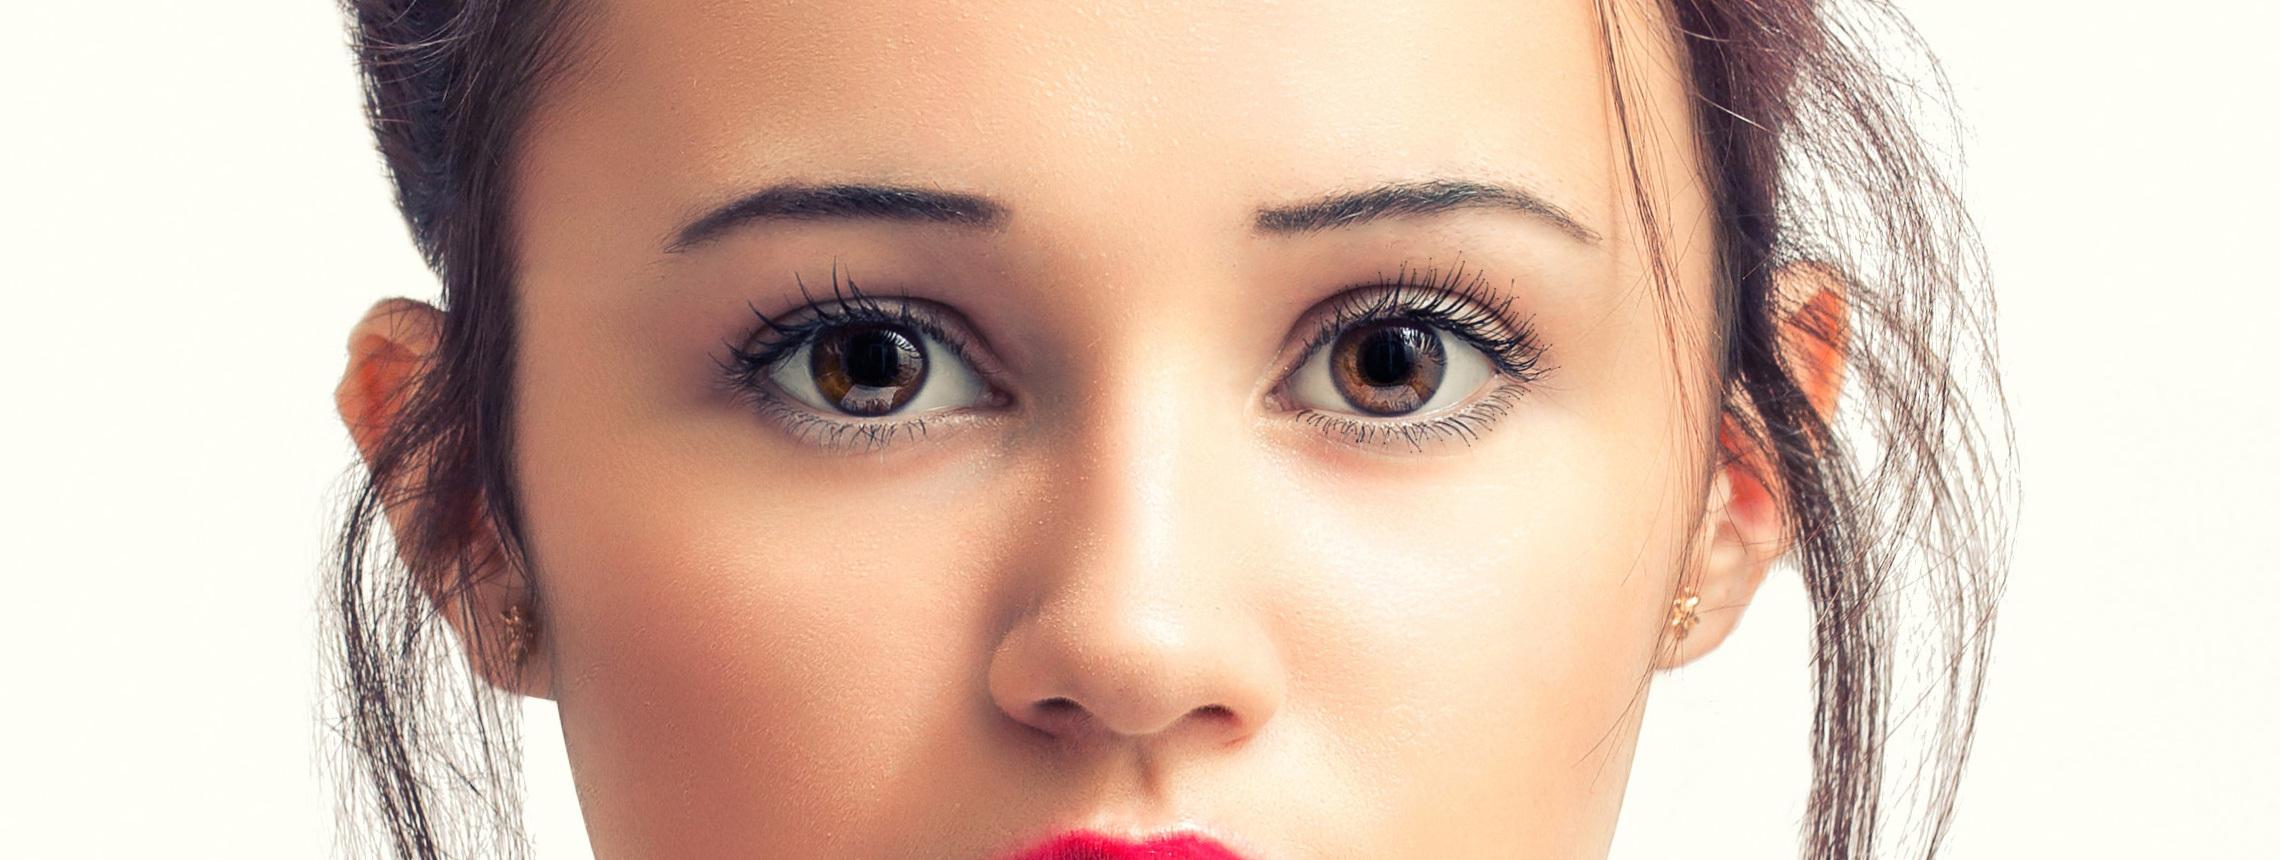 Create Fabulous, Realistic Eyelashes on Your Selfies